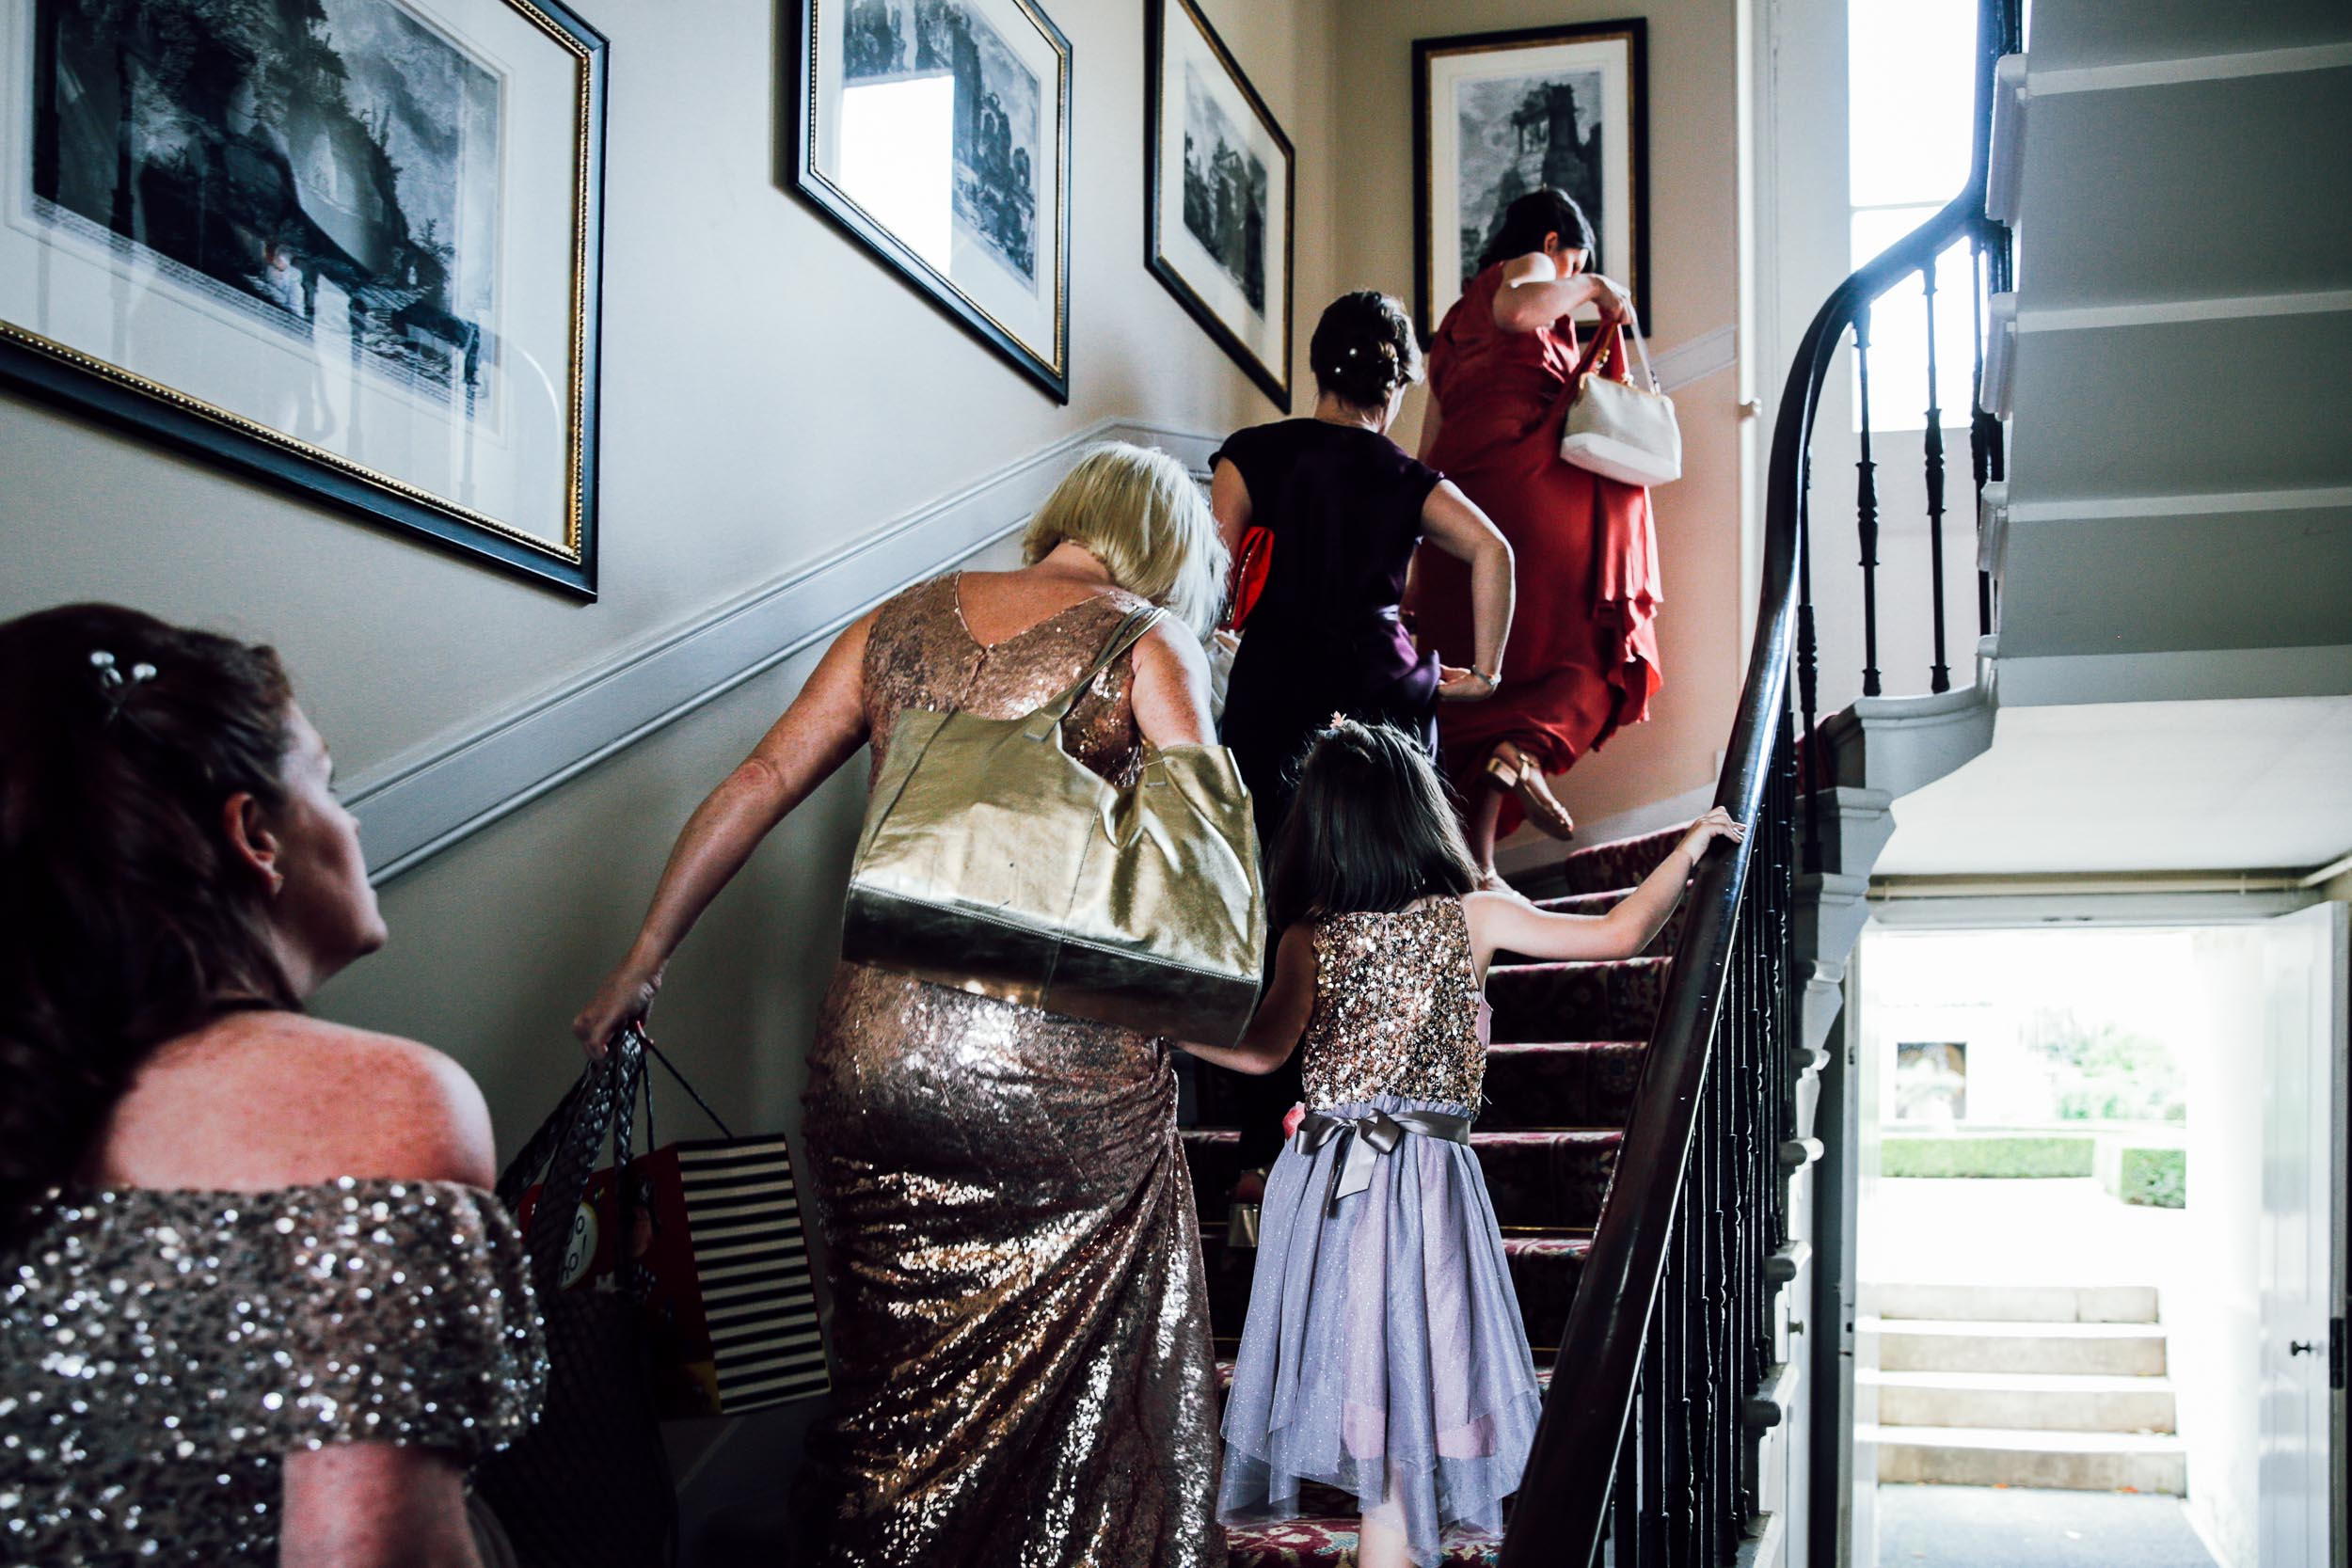 syon-house-wedding-photographer-london 041.jpg